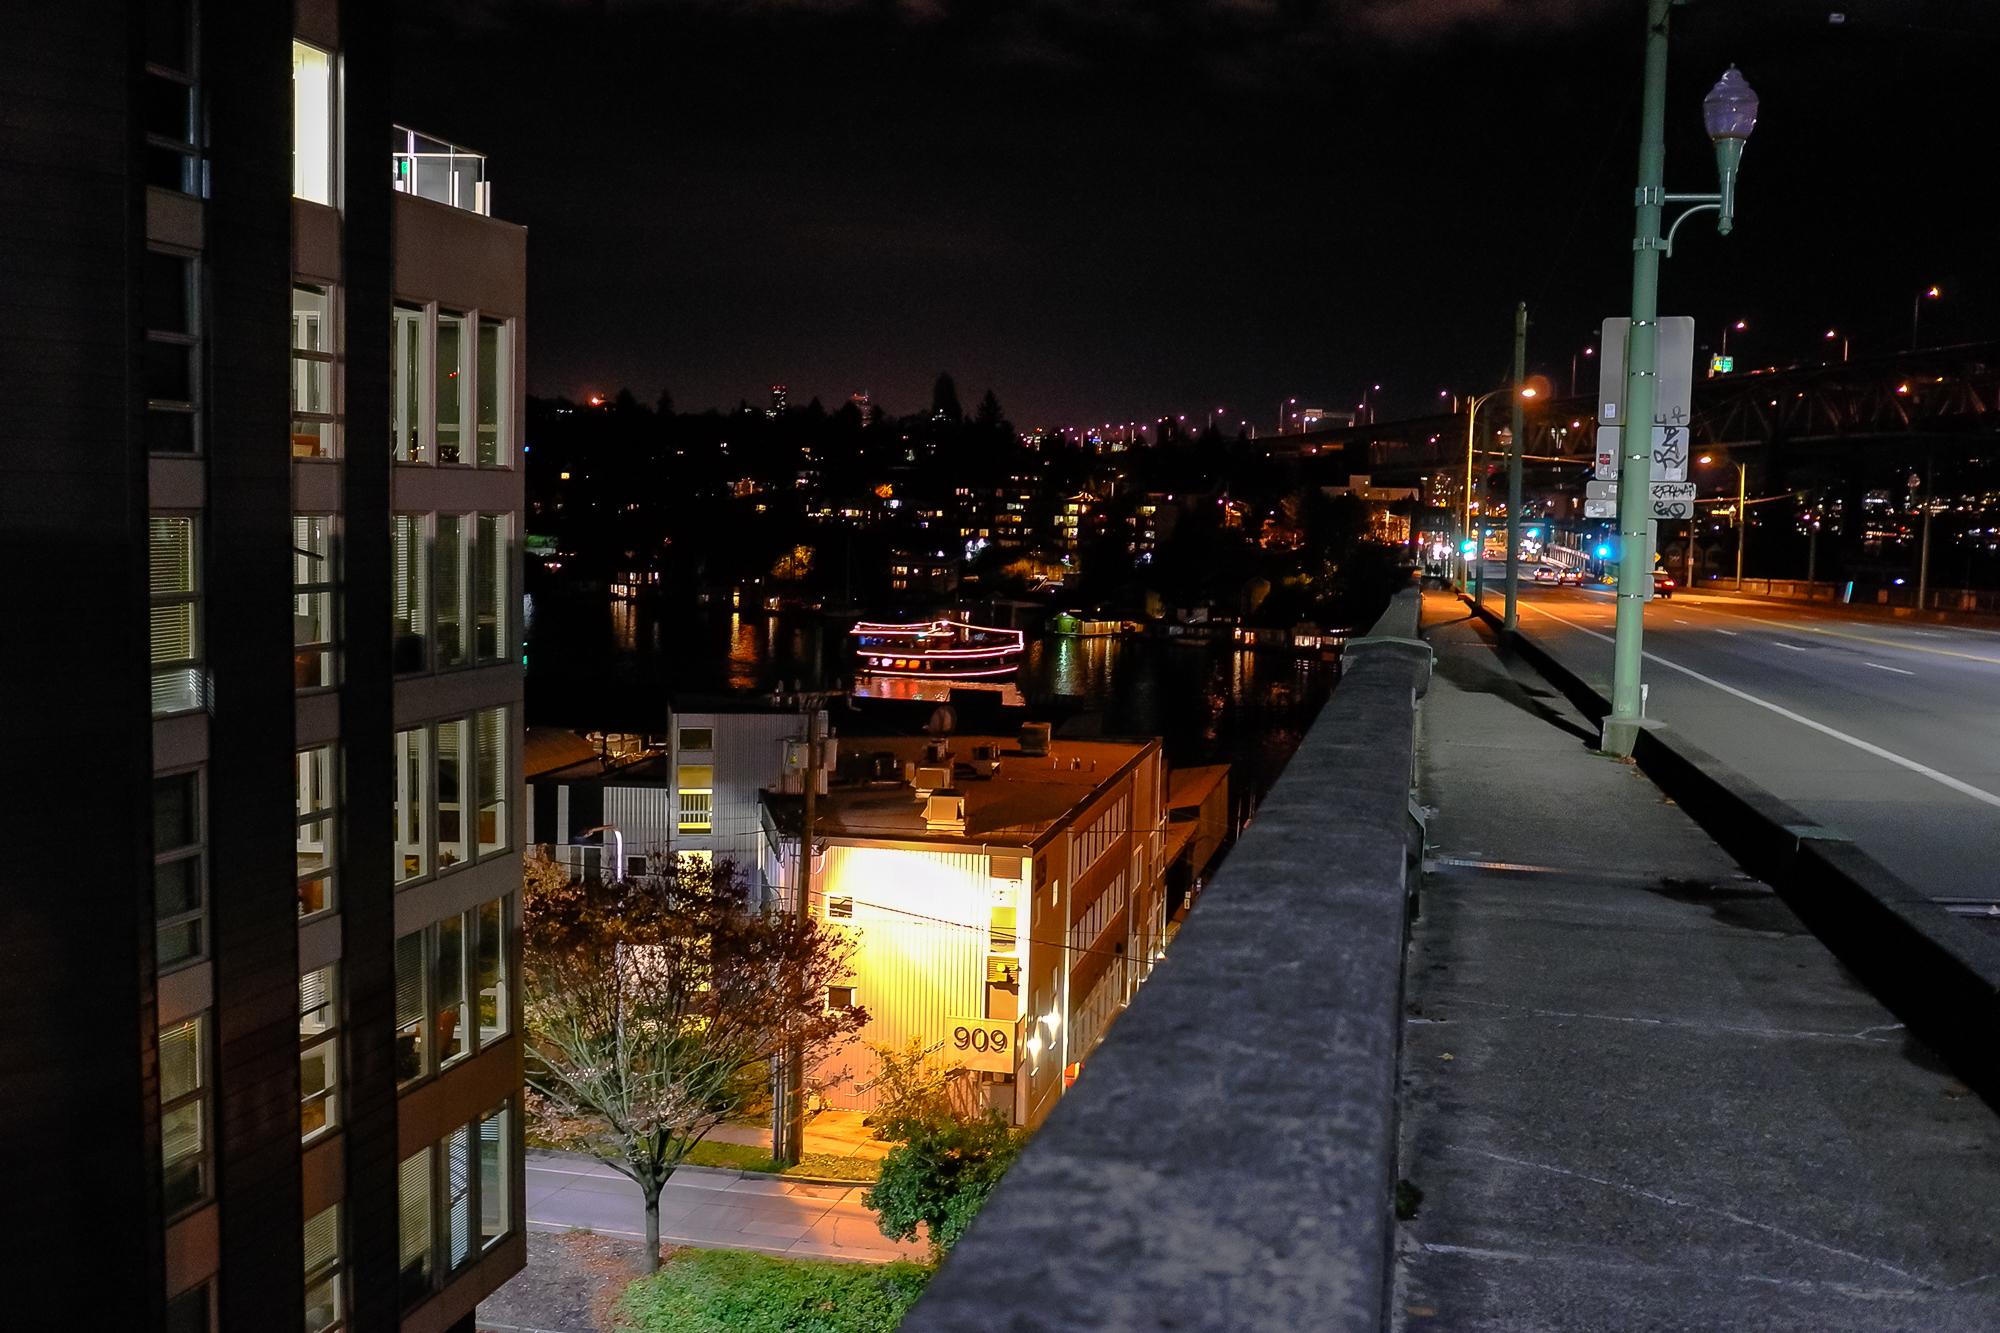 University Bridge, night